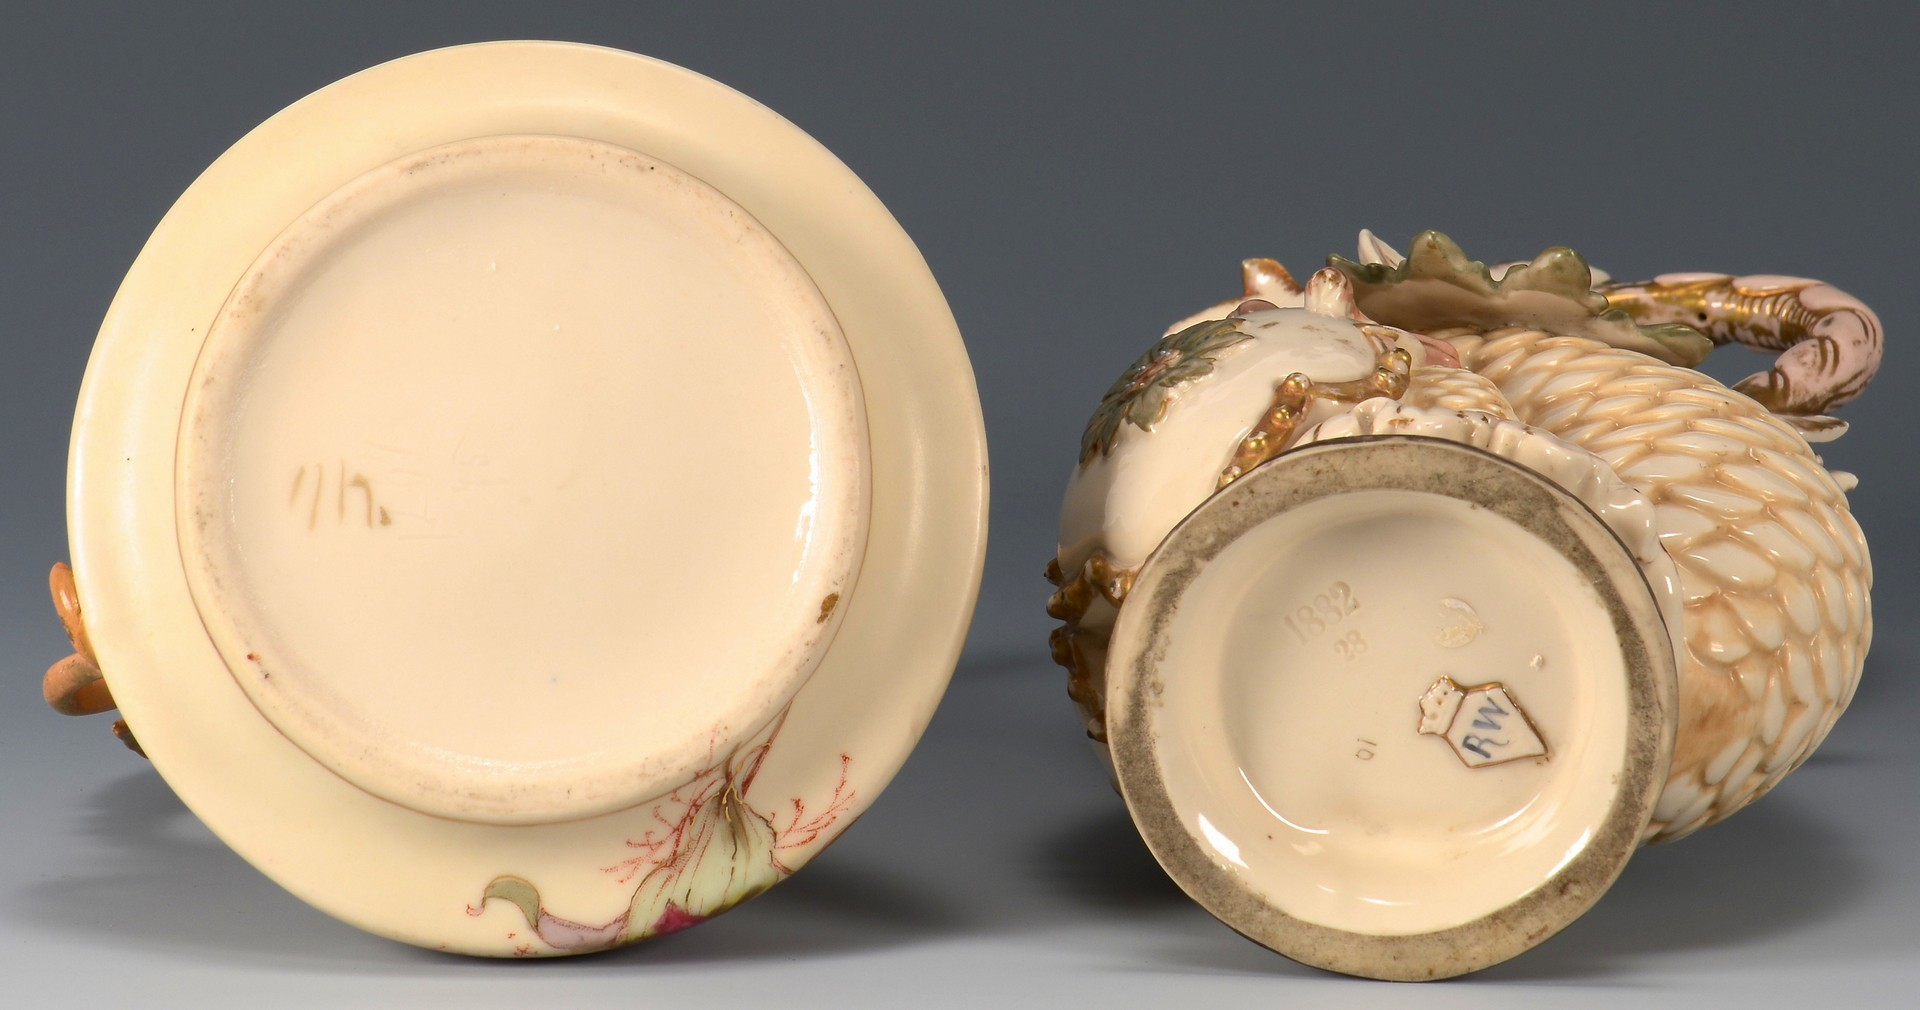 Lot 3594251: 2 Continental Figural Porcelain Ewers